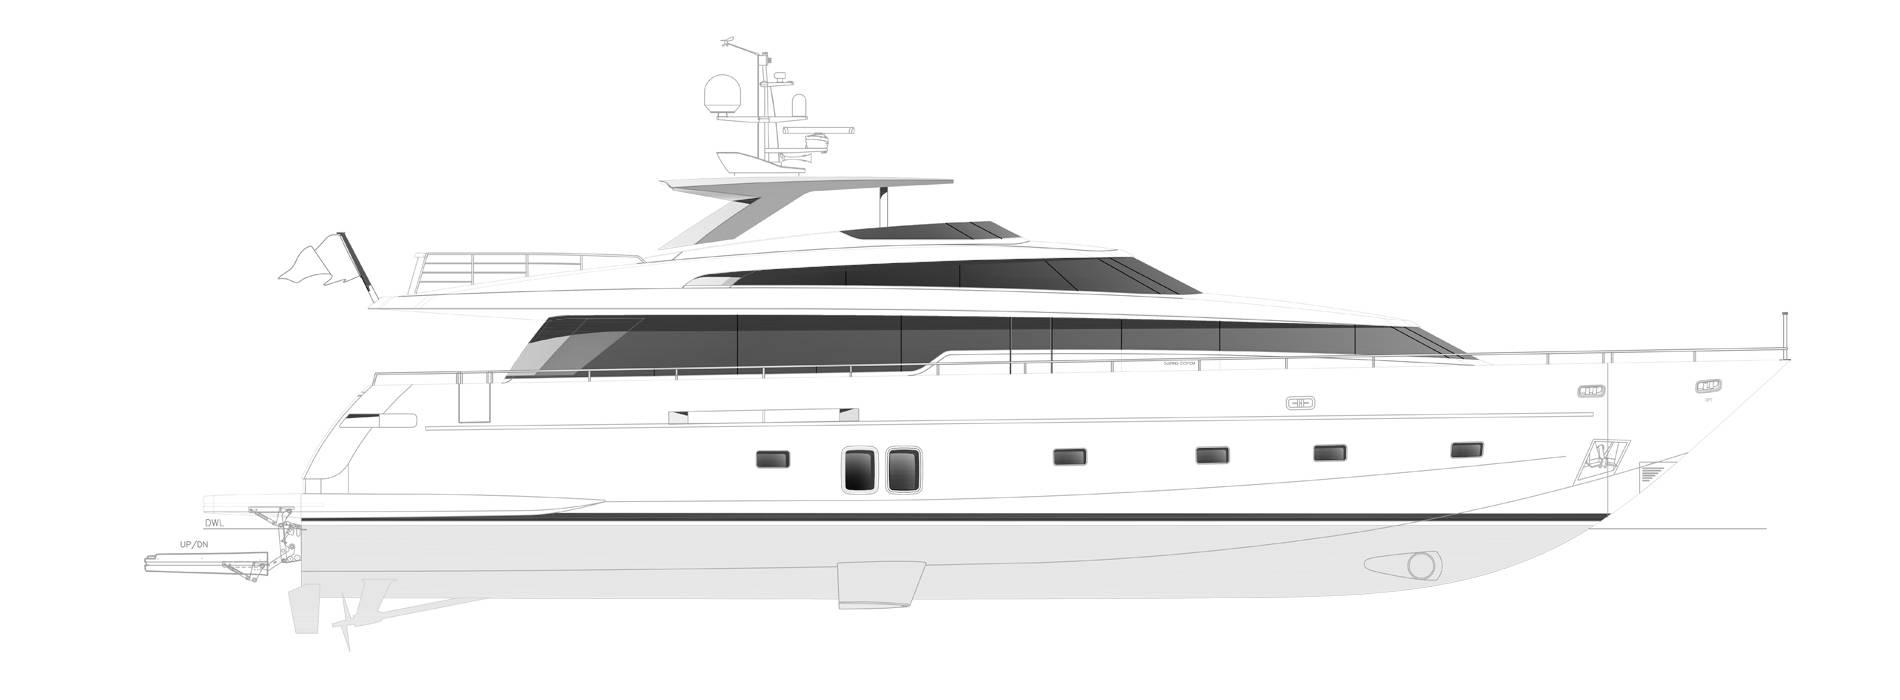 Sanlorenzo Yachts SL96-631 Perfil